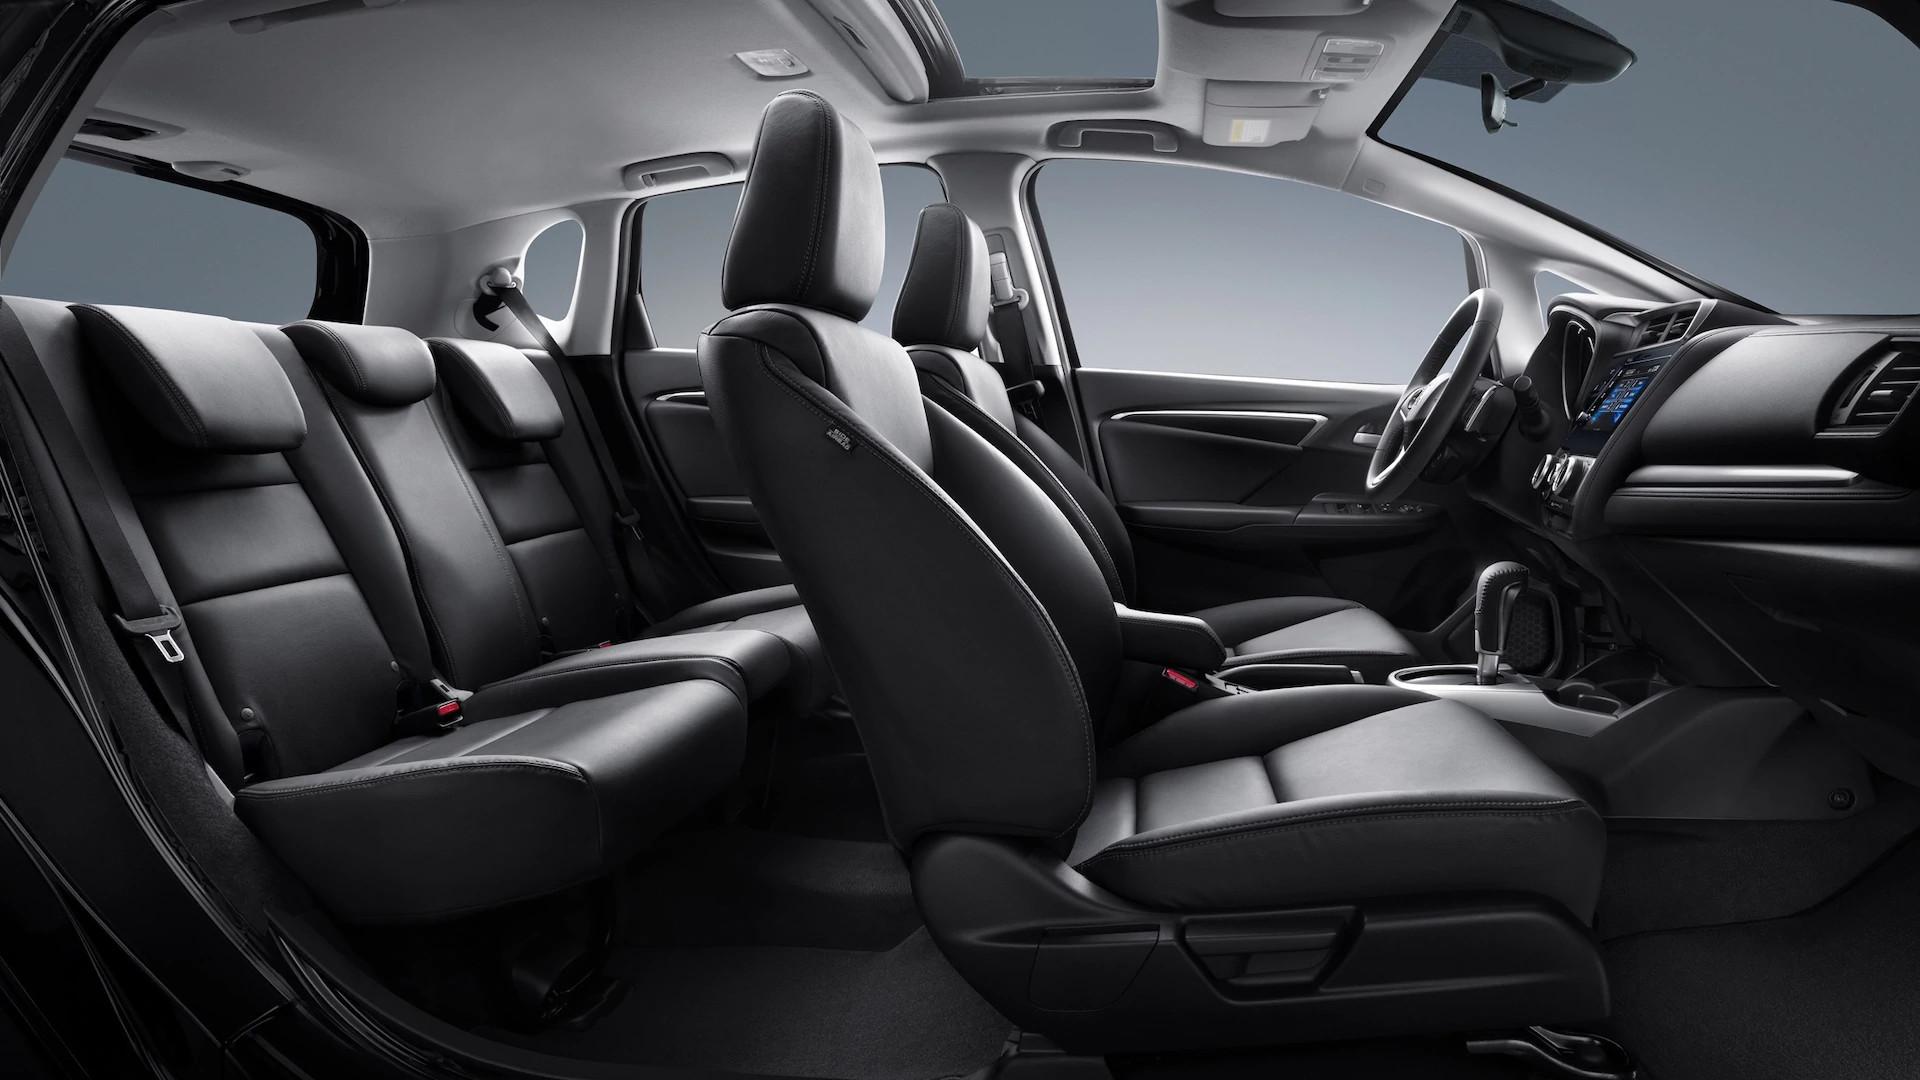 Interior of the 2020 Honda Fit